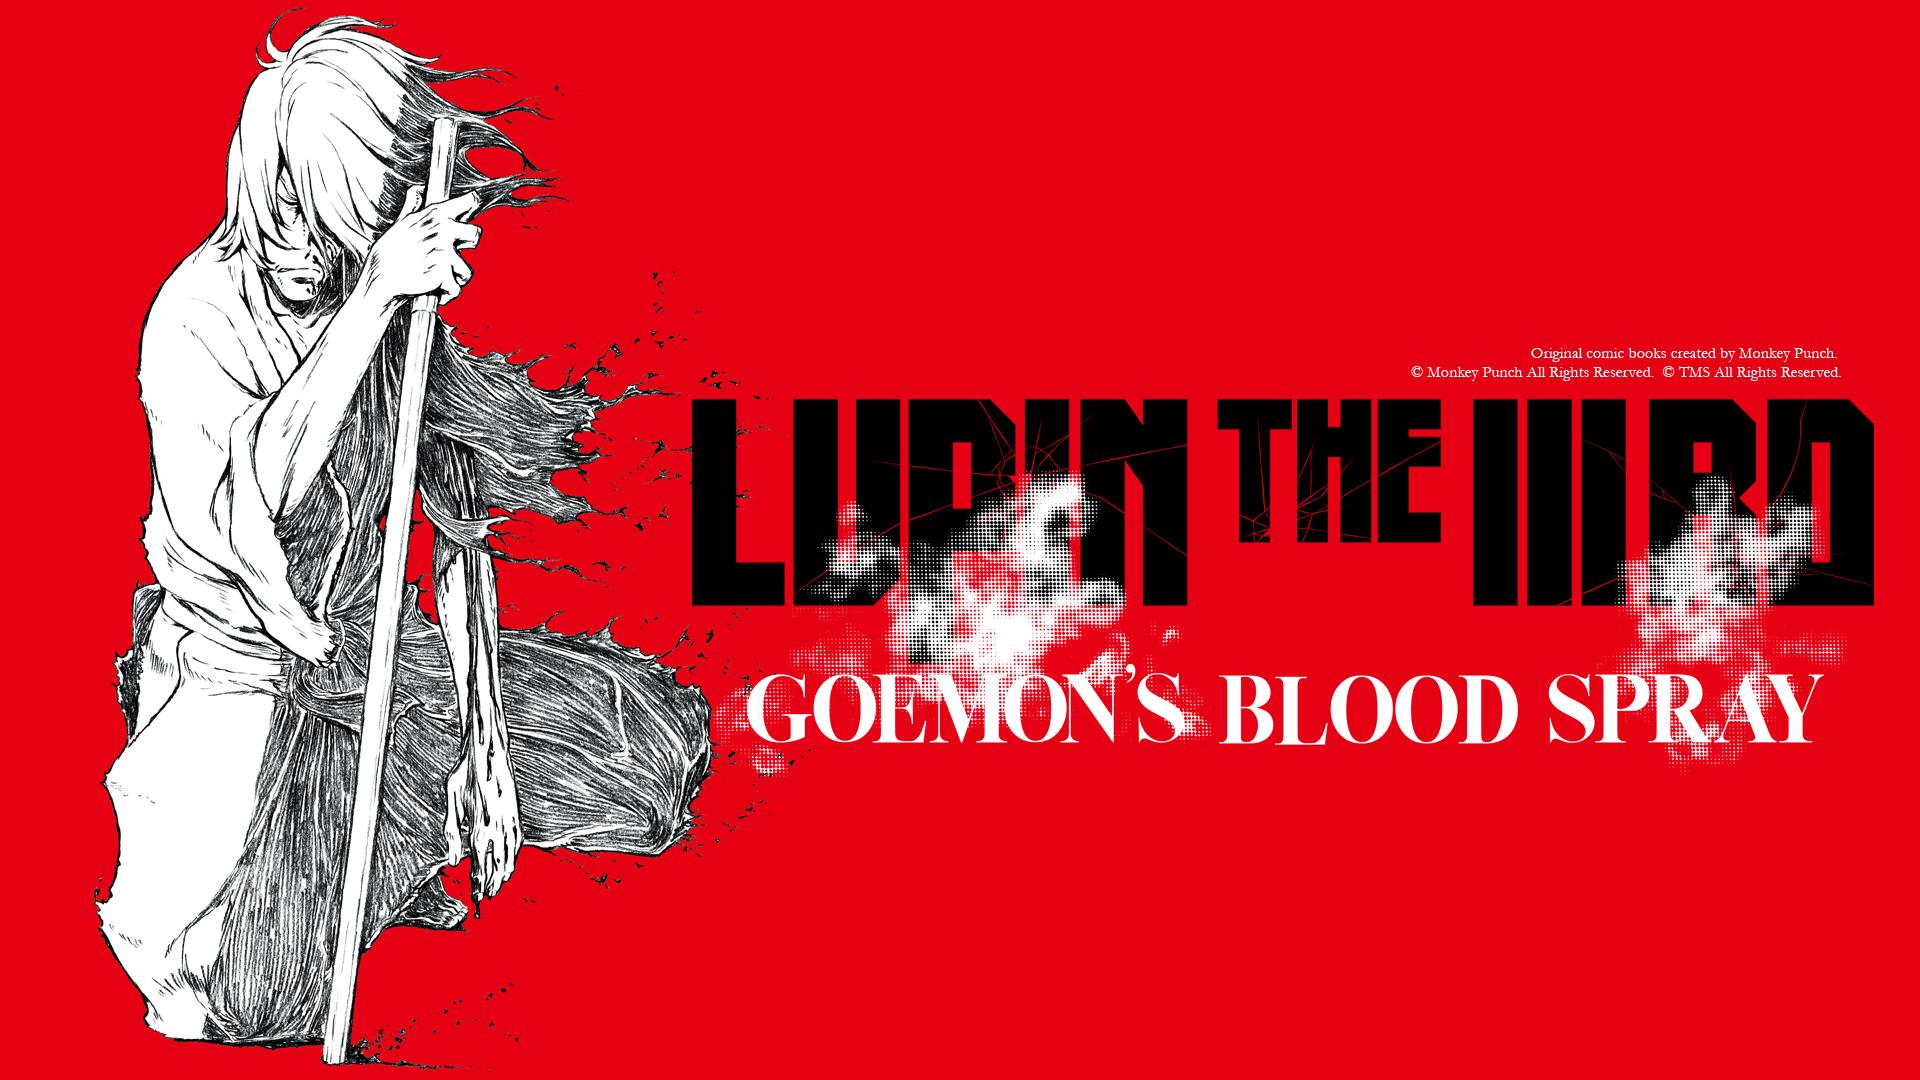 Lupin the IIIrd: Goemon's Blood Spray (English Dub)